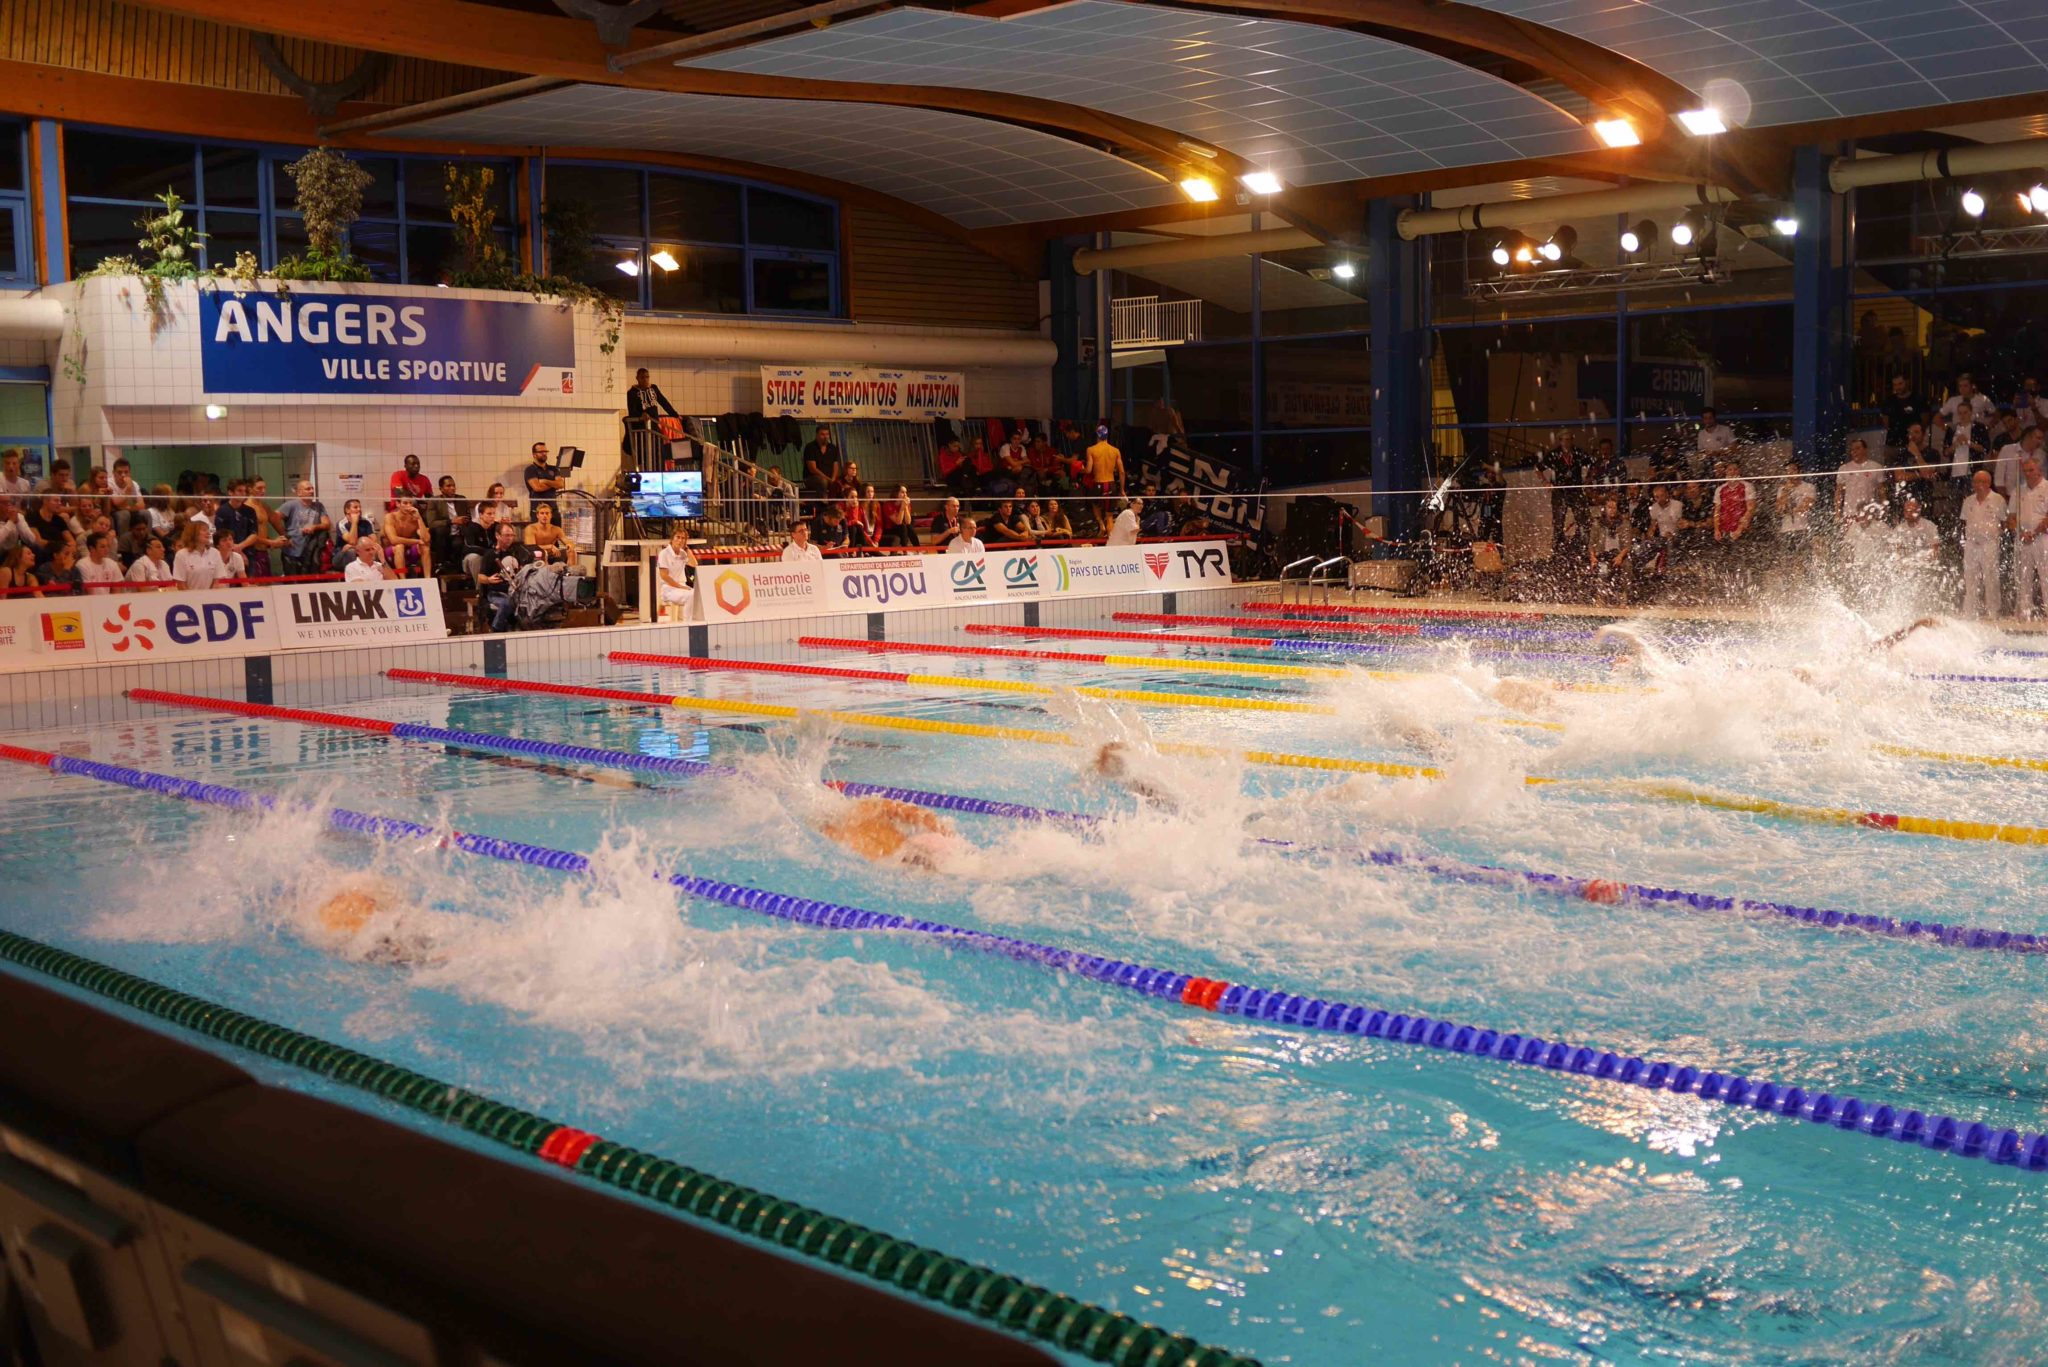 championnats-france-natation-2016-angers-3